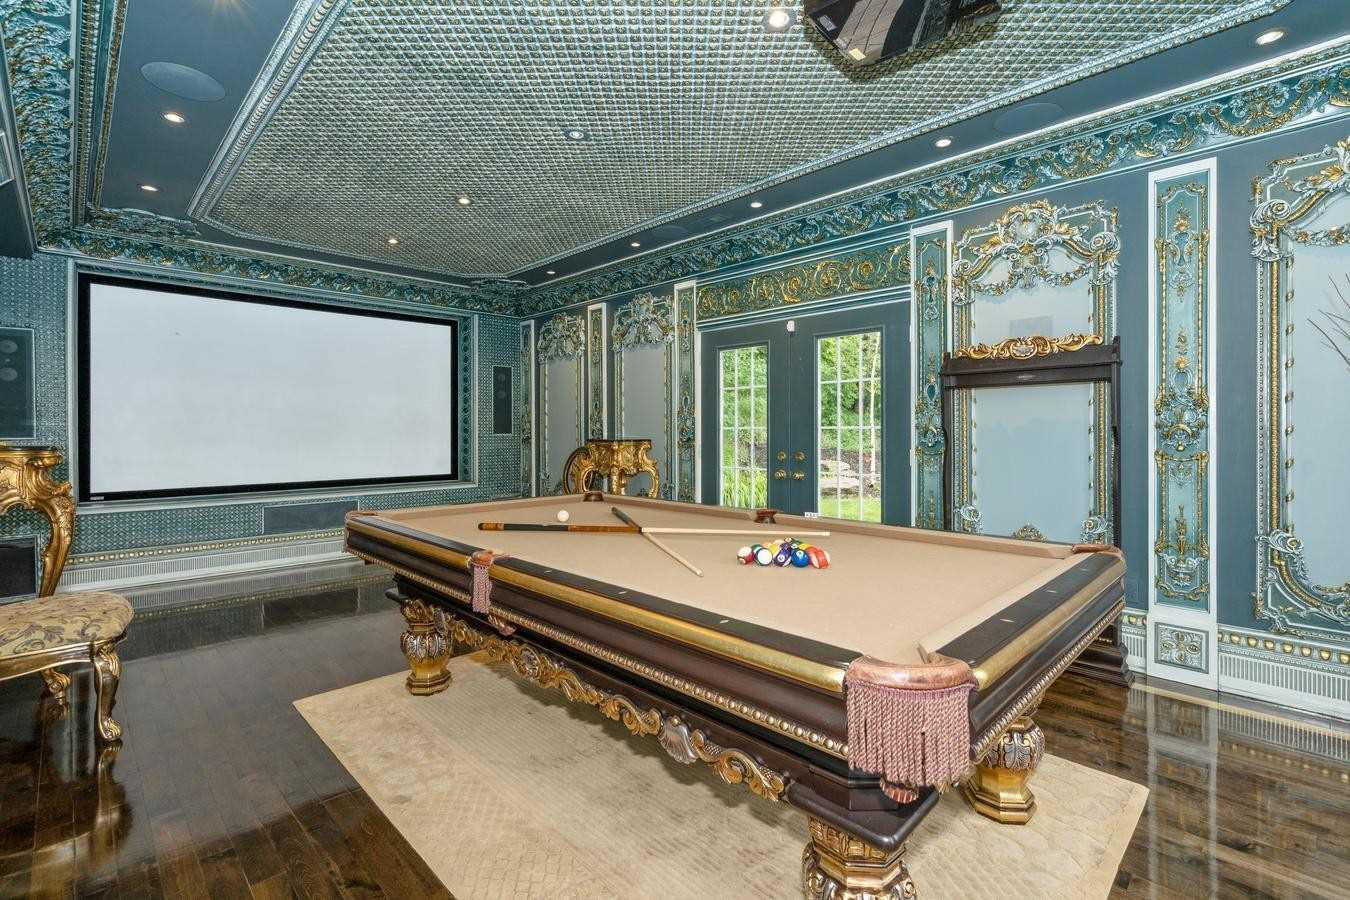 10201 Pine Valley Dr, Vaughan, Ontario L4L 1A6, 4 Bedrooms Bedrooms, 11 Rooms Rooms,2 BathroomsBathrooms,Detached,For Sale,Pine Valley,N5353435